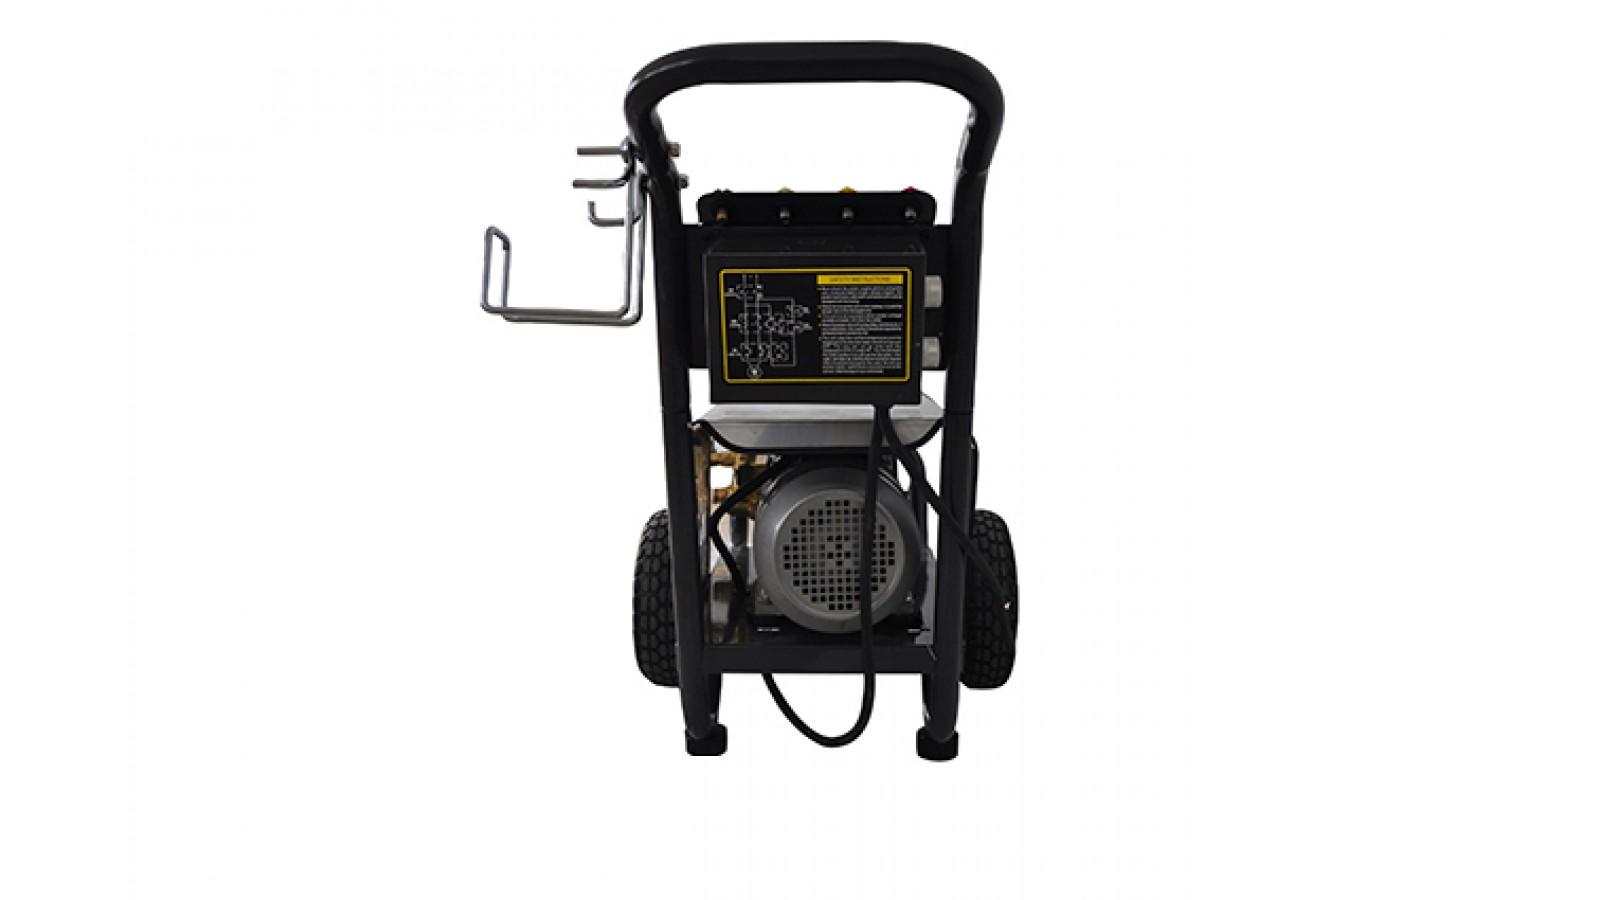 Idropulitrice alta pressione da 180bar